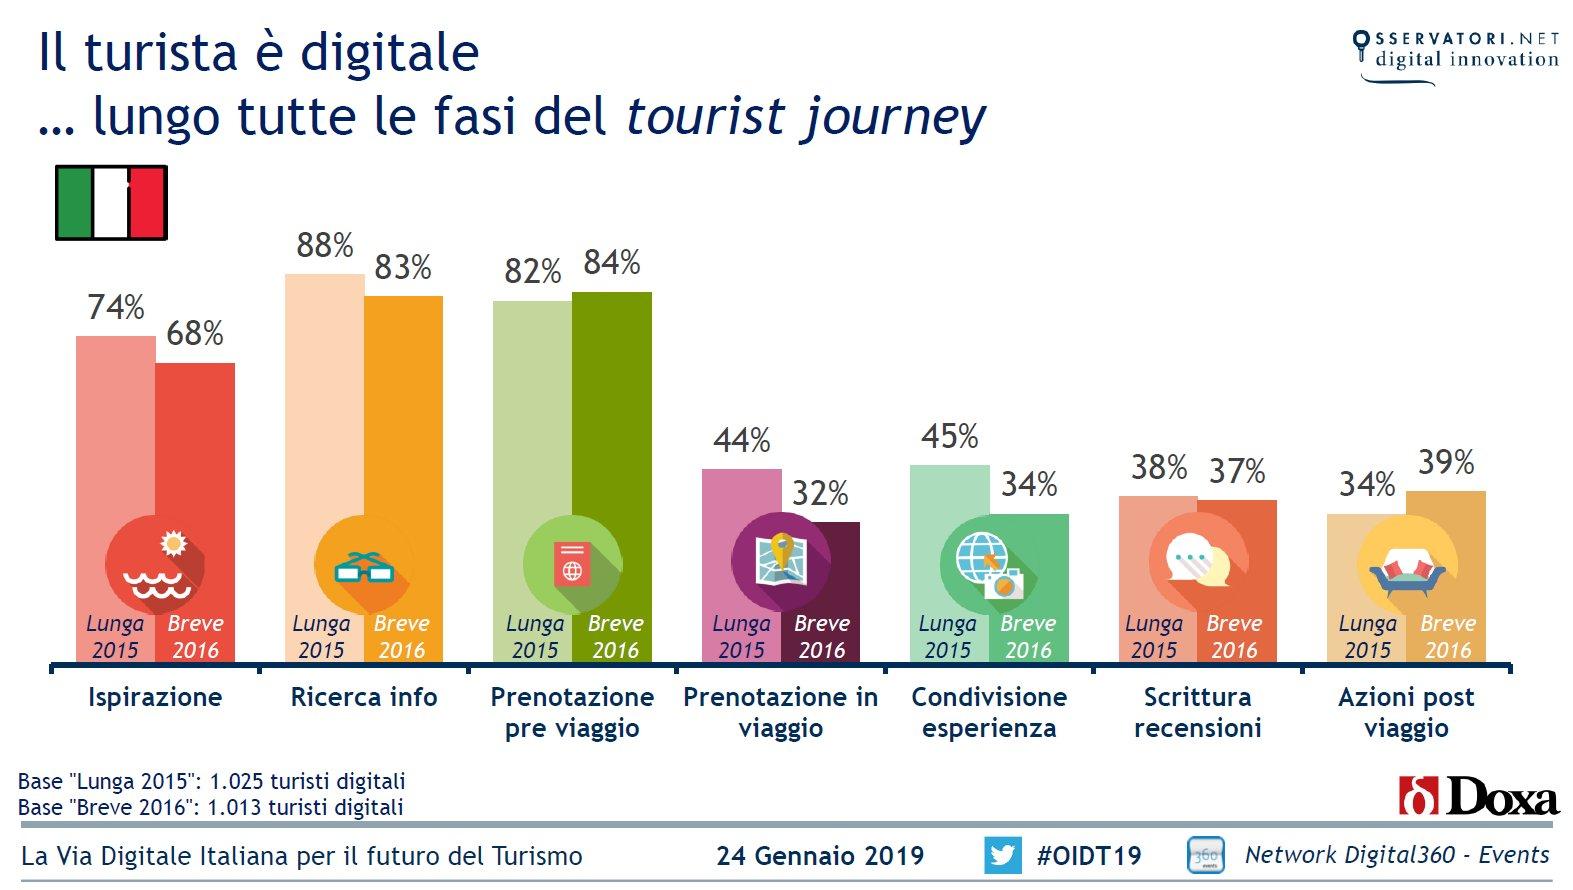 Tourist-journey-digitale-italia